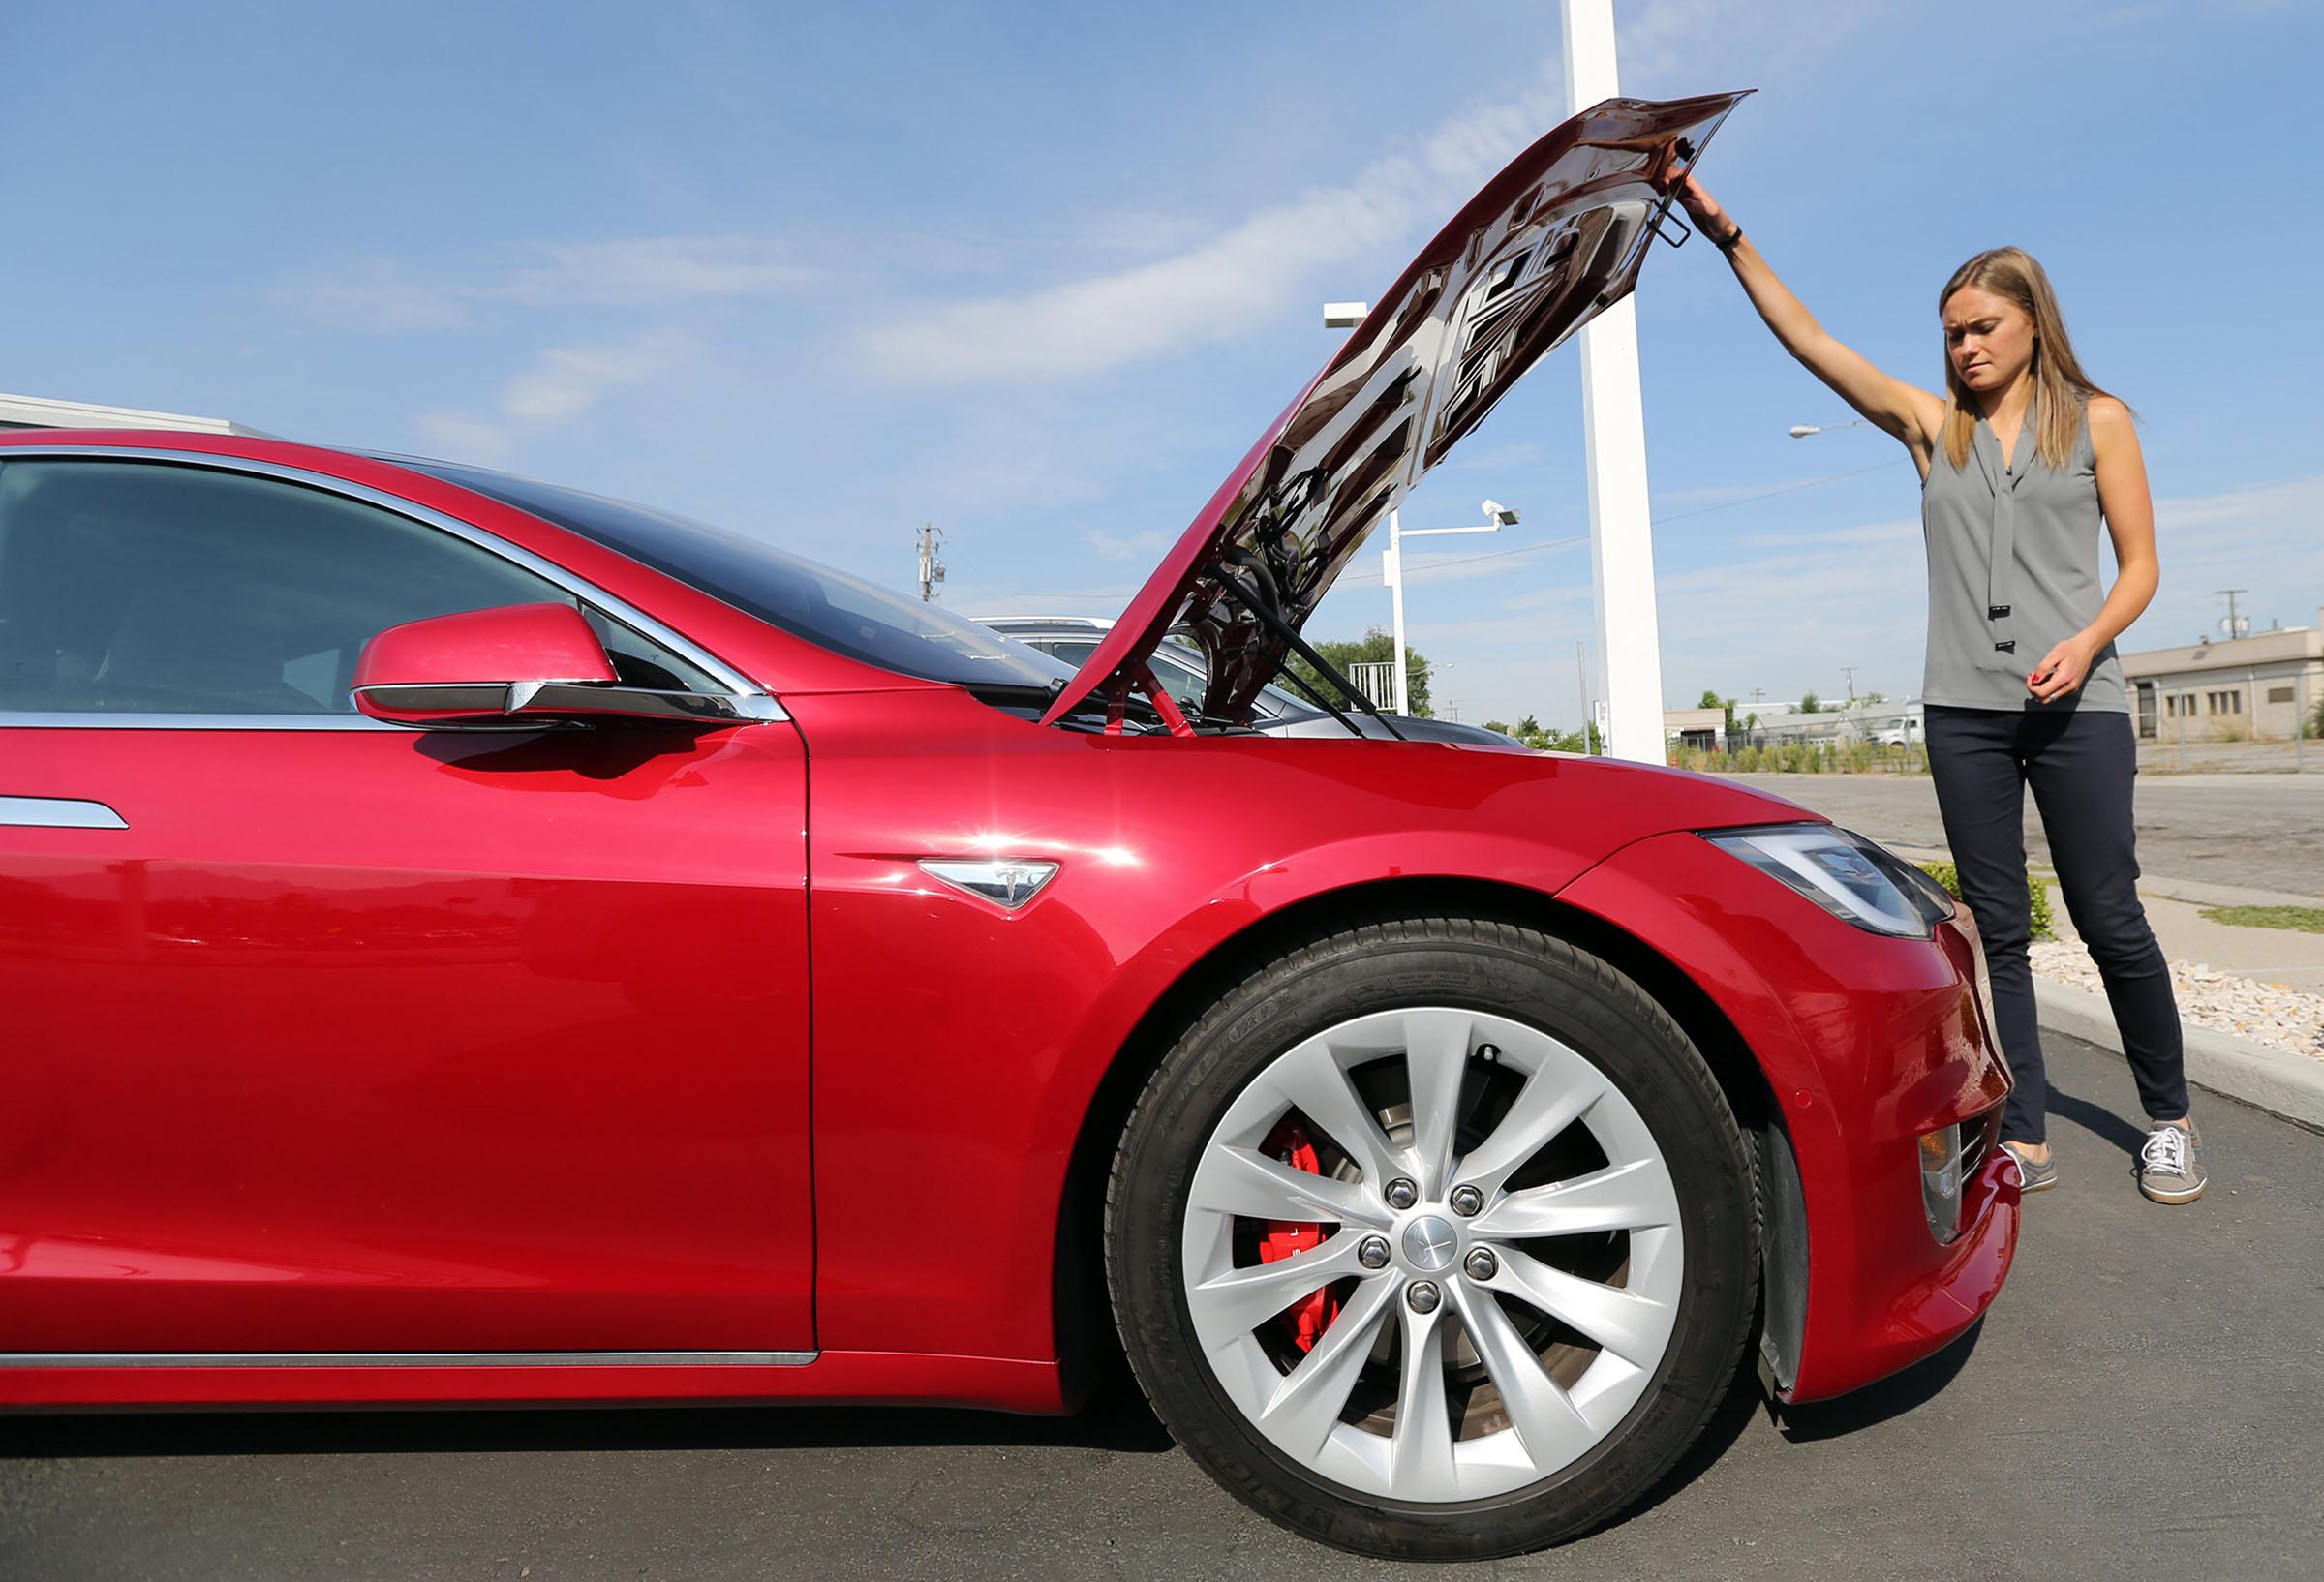 Sonja Koch, Tesla communications spokeswoman, shows storage space under the hood of a Tesla Model S P90D outside the Tesla showroom in Salt Lake City on Tuesday, Aug. 23, 2016.